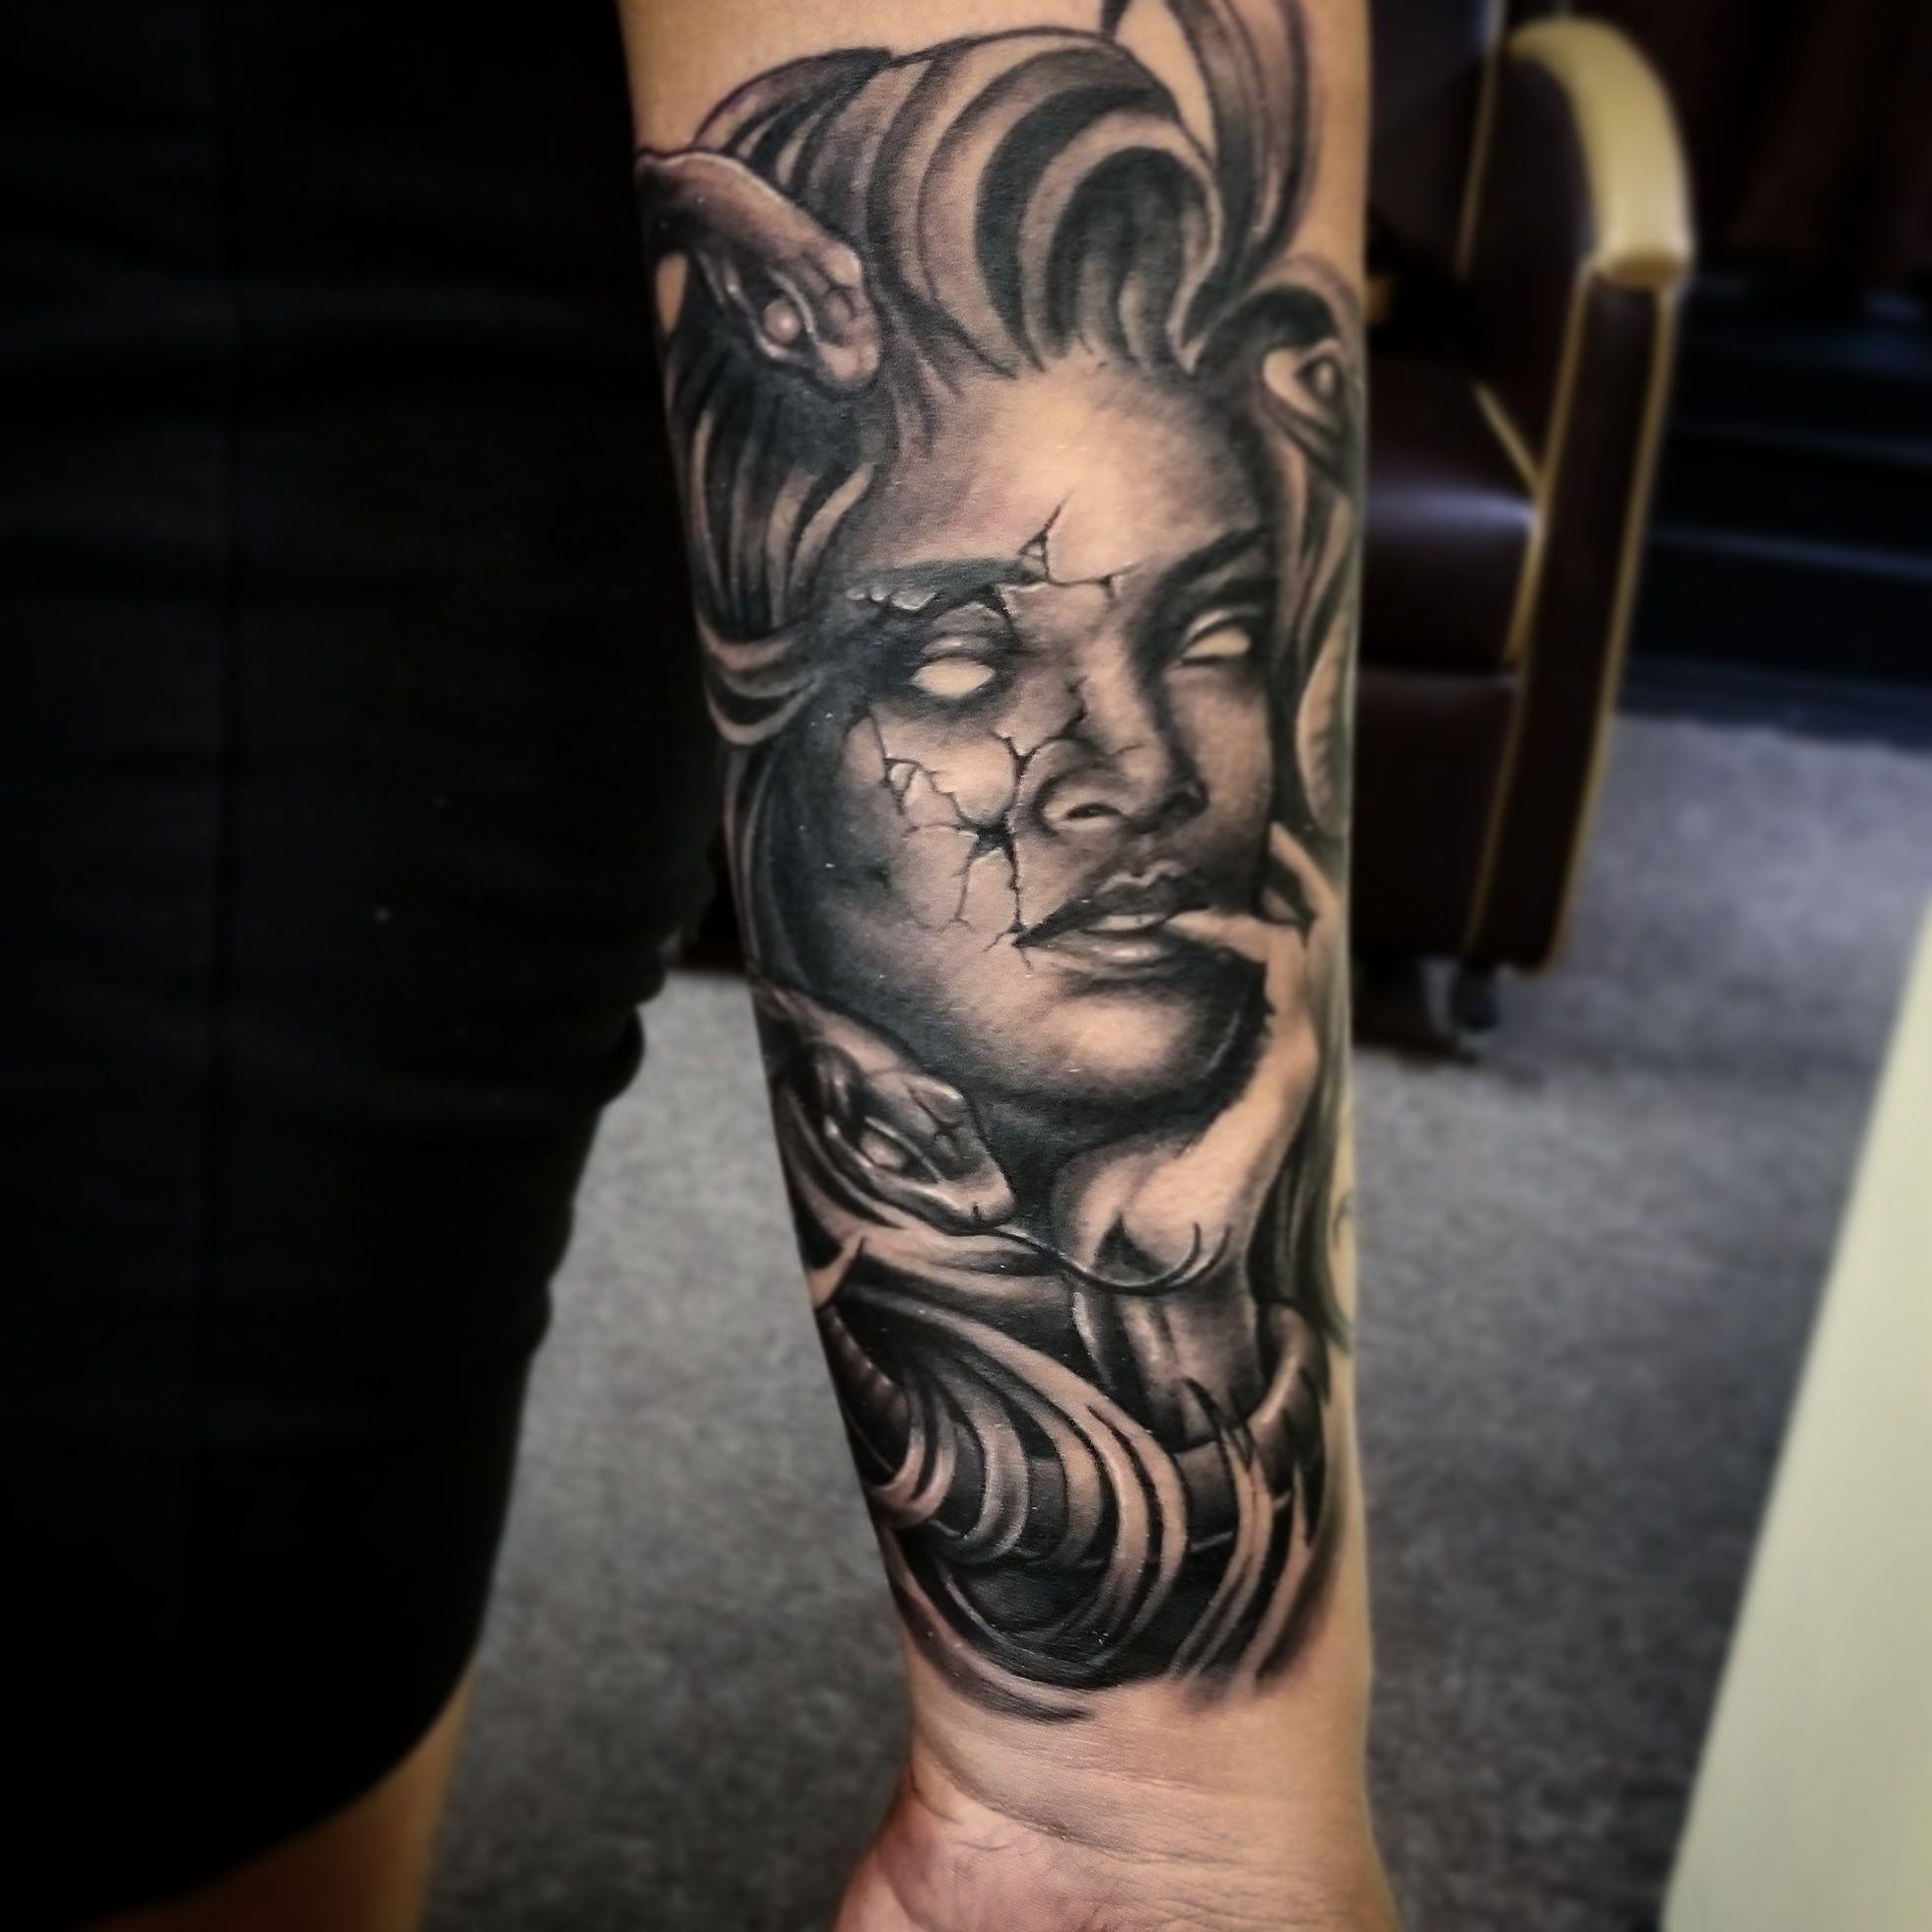 Ian Johnson, Tattoos by Ian, Tattoo, Chicago, Chicago Tattoo artist ...